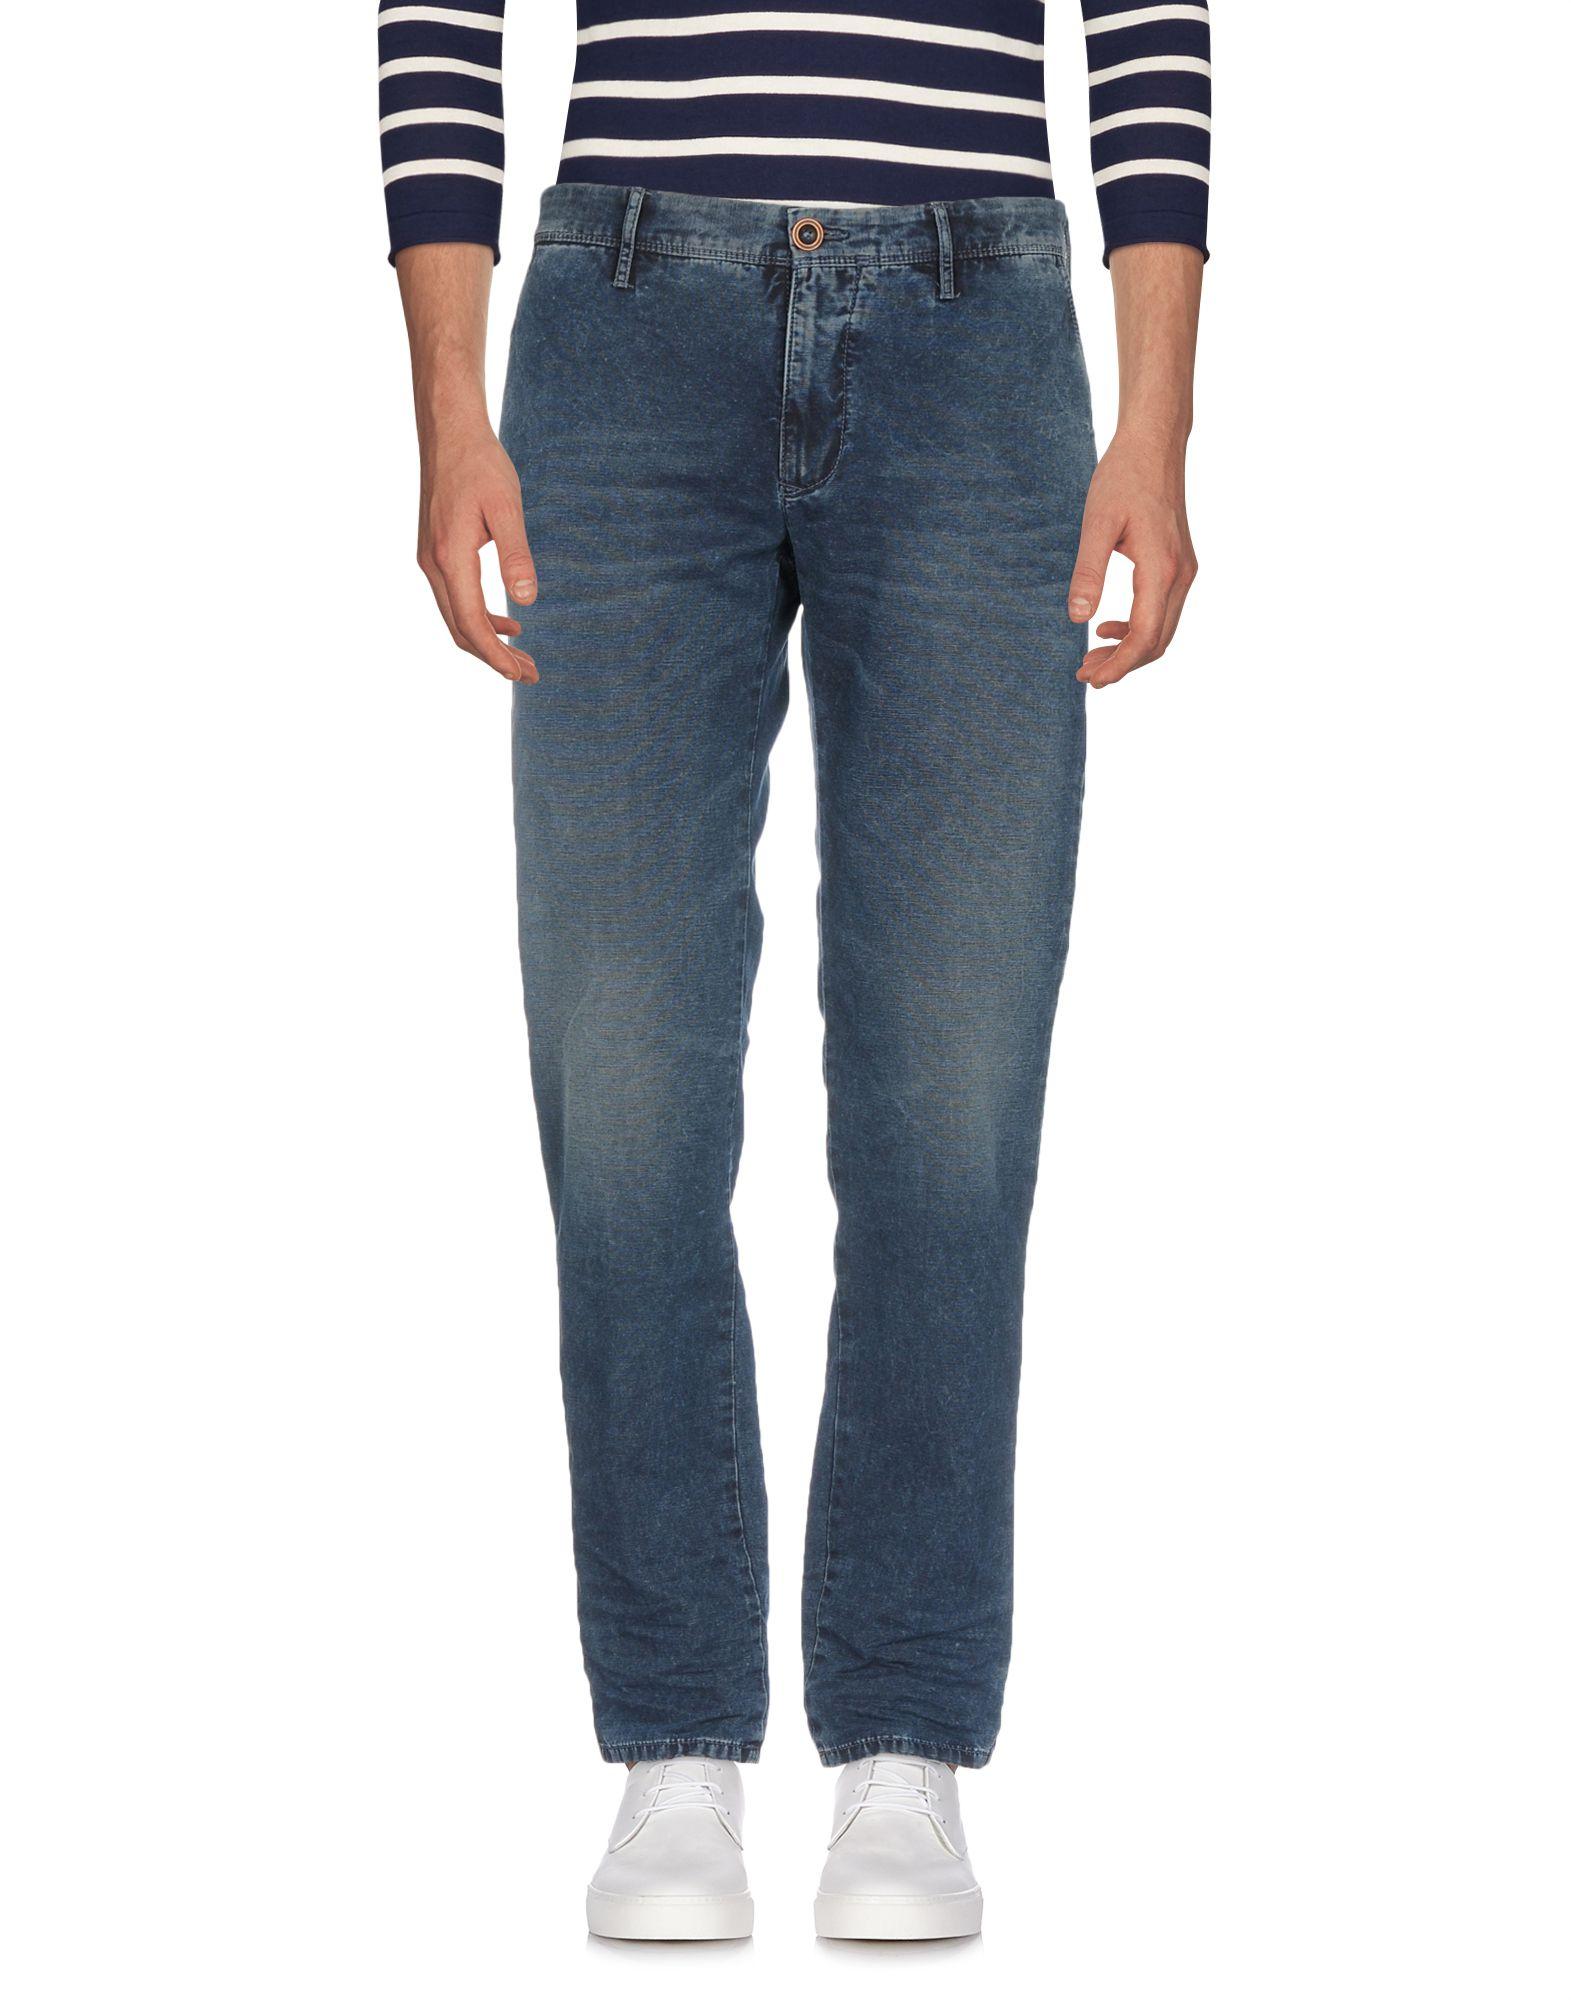 Pantaloni Jeans Incotex Uomo - Acquista online su